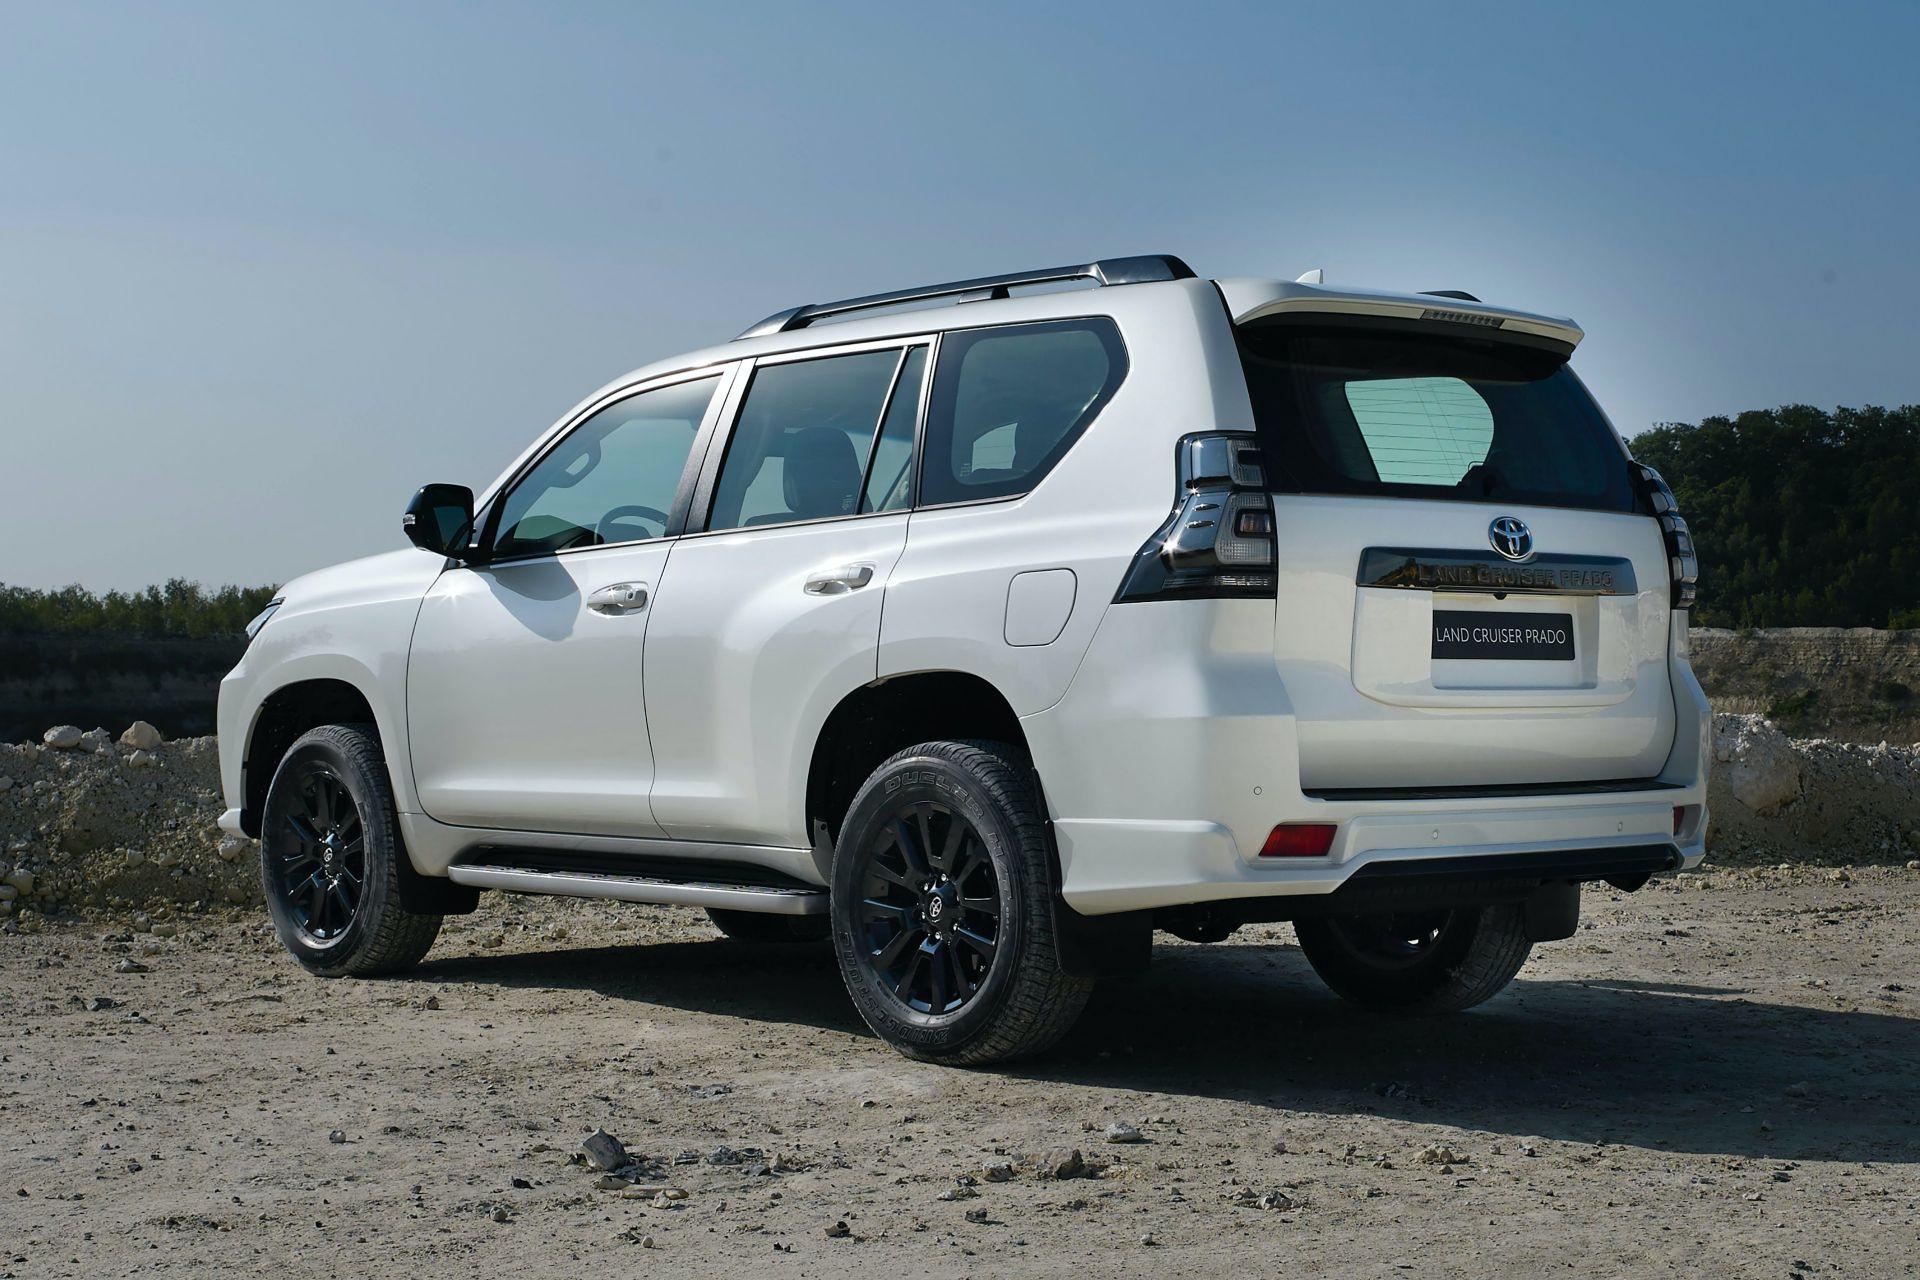 задние фонари Toyota Land Cruiser Prado 150 Black Pack 2021